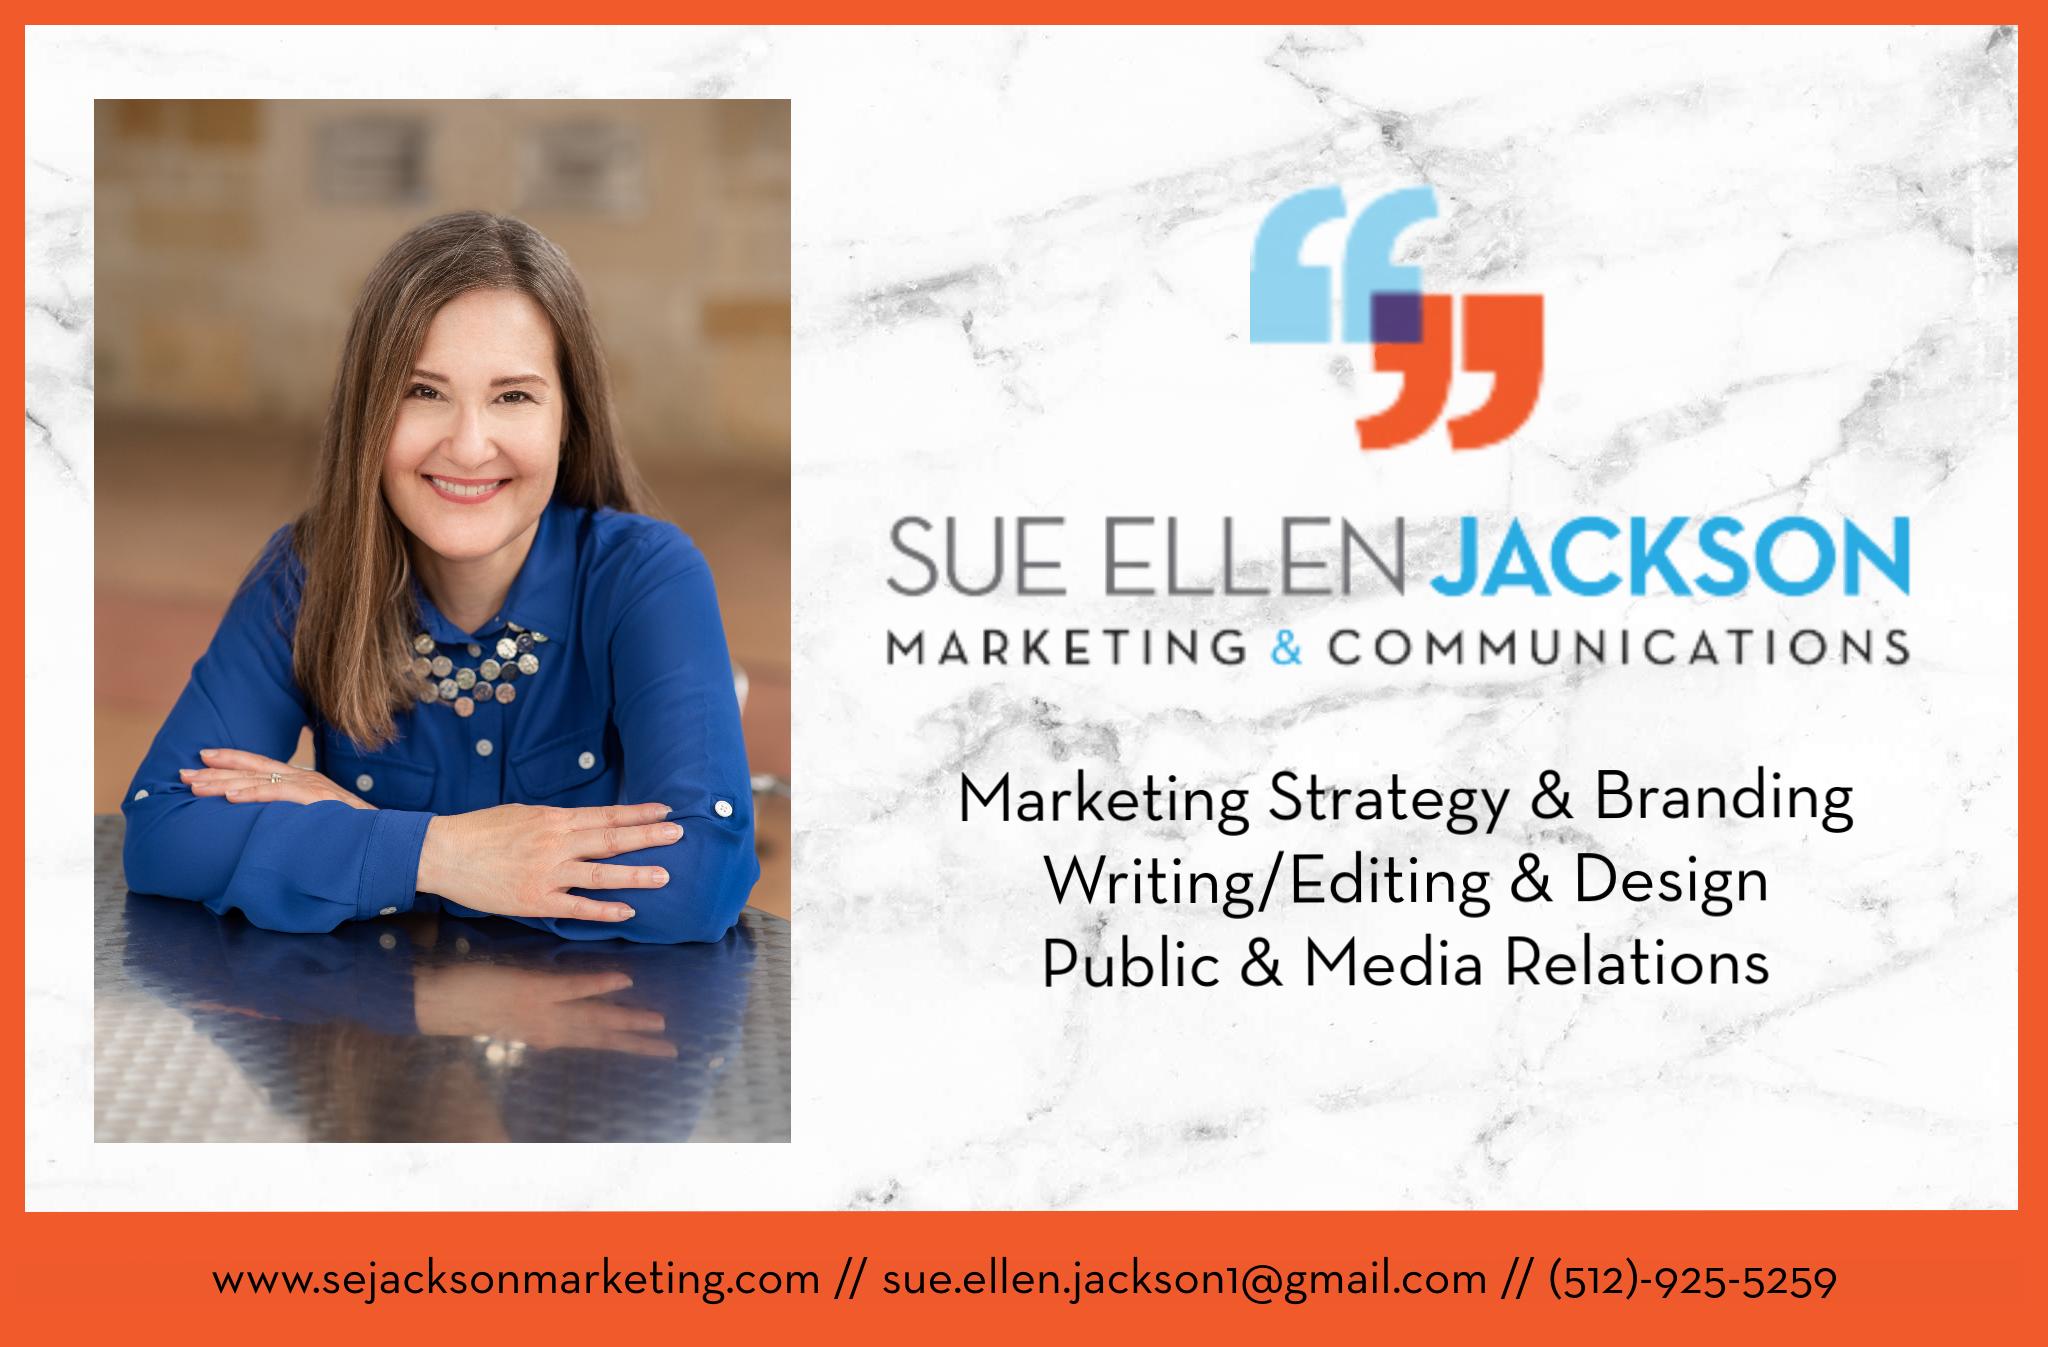 Sue Ellen Jackson Marketing & Communication